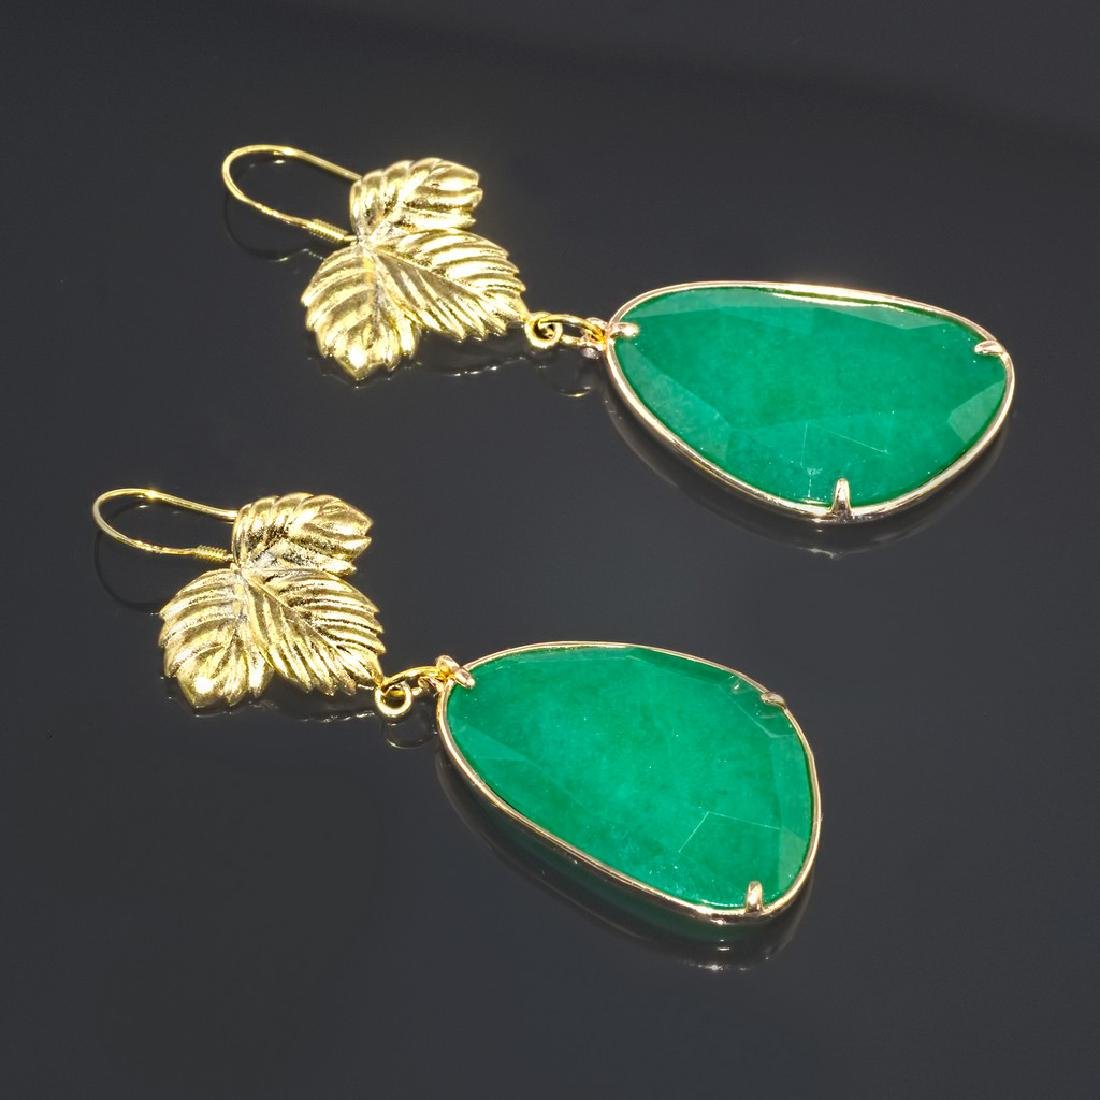 Emerald Green Jade Leaf Earrings - 2